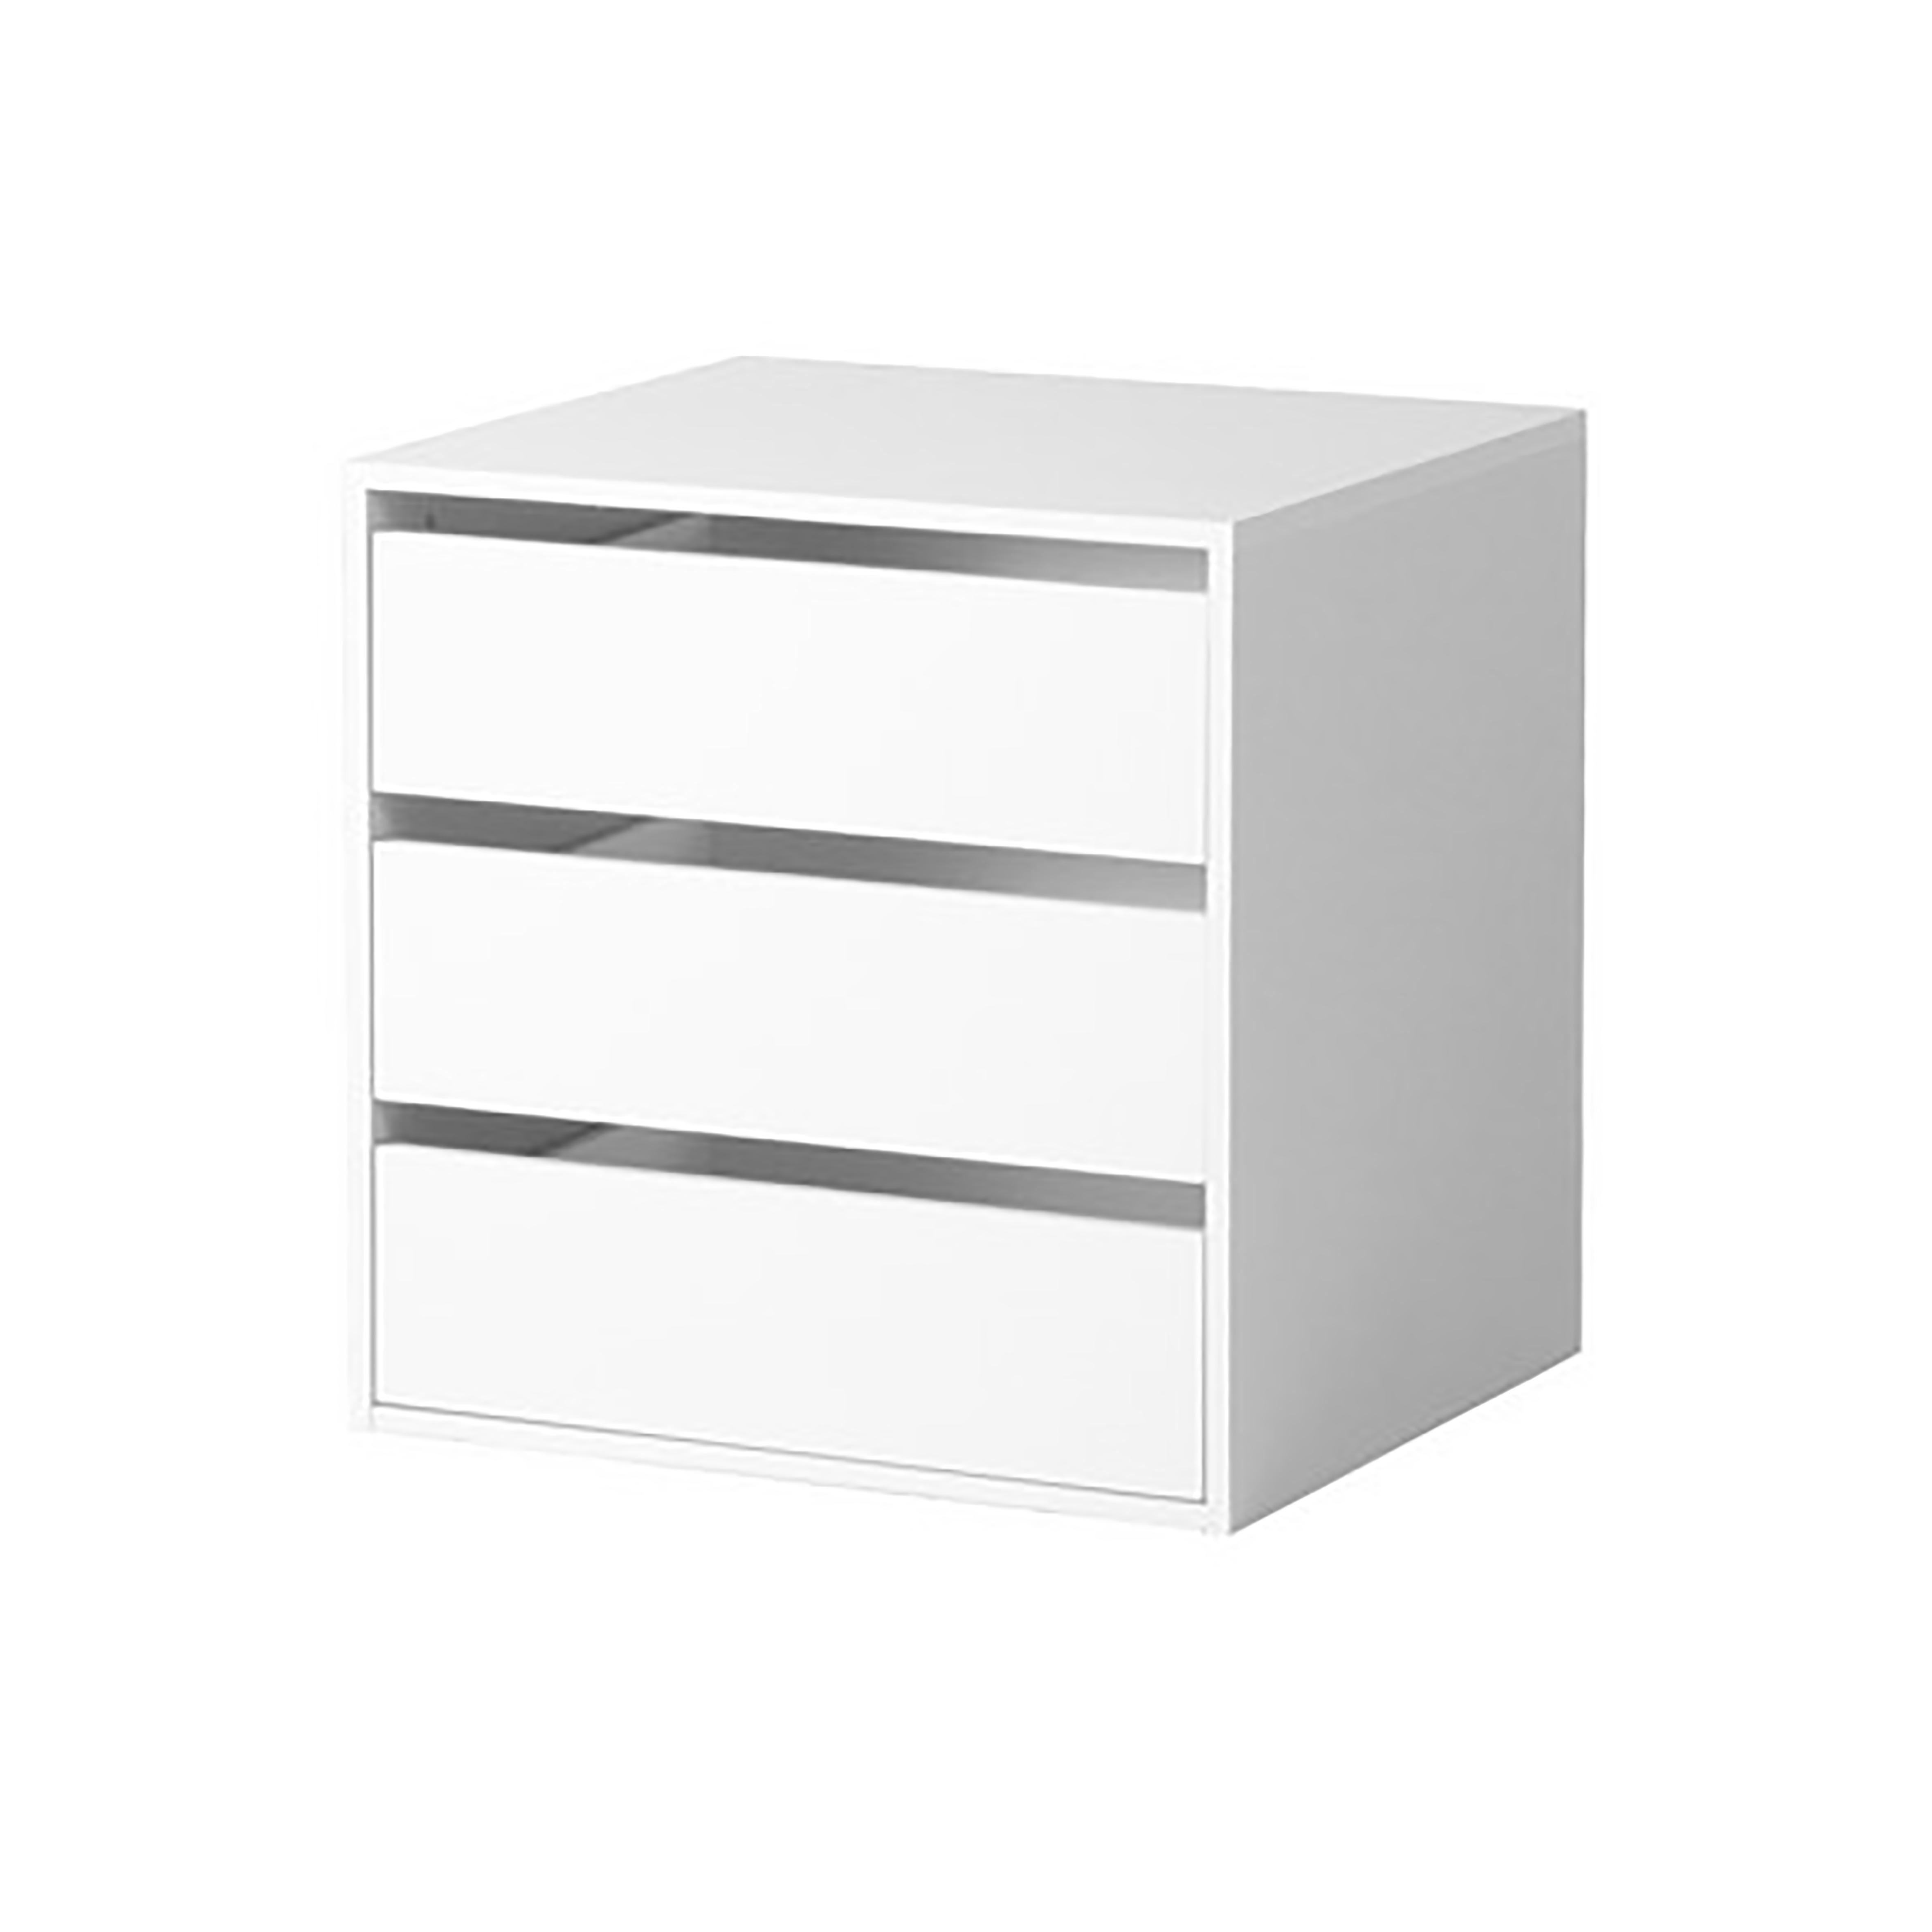 Cassettiera interna per armadio bianca ebay - Cassettiera interna per armadio ikea ...